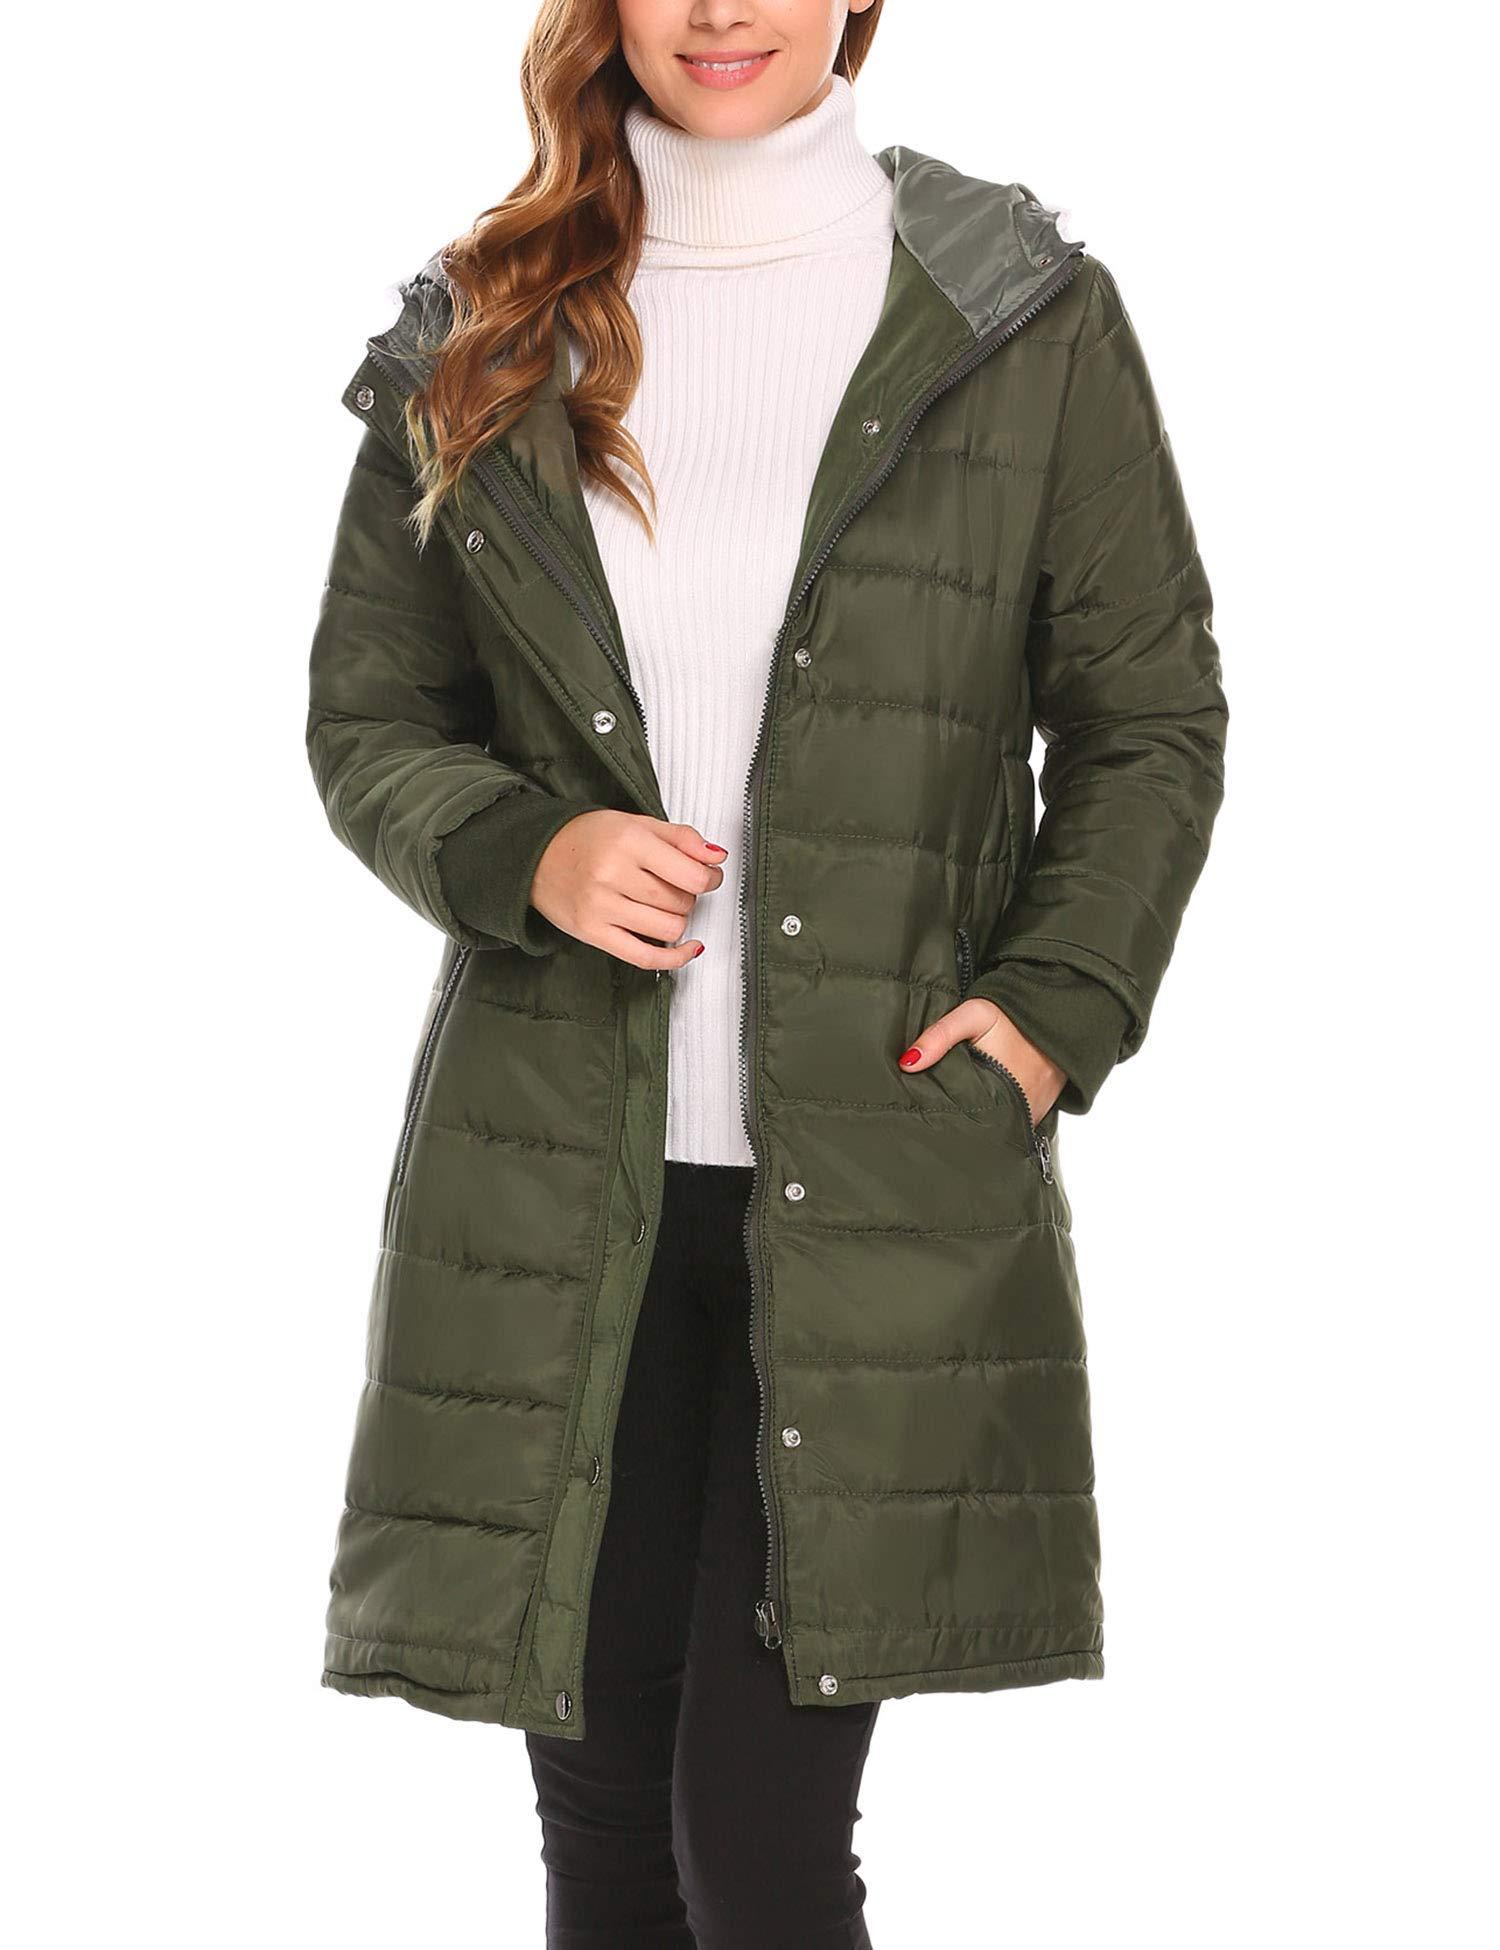 Misakia Women's Lightweight Packable Down Jacket Outwear Puffer Down Coats(Army Green L)